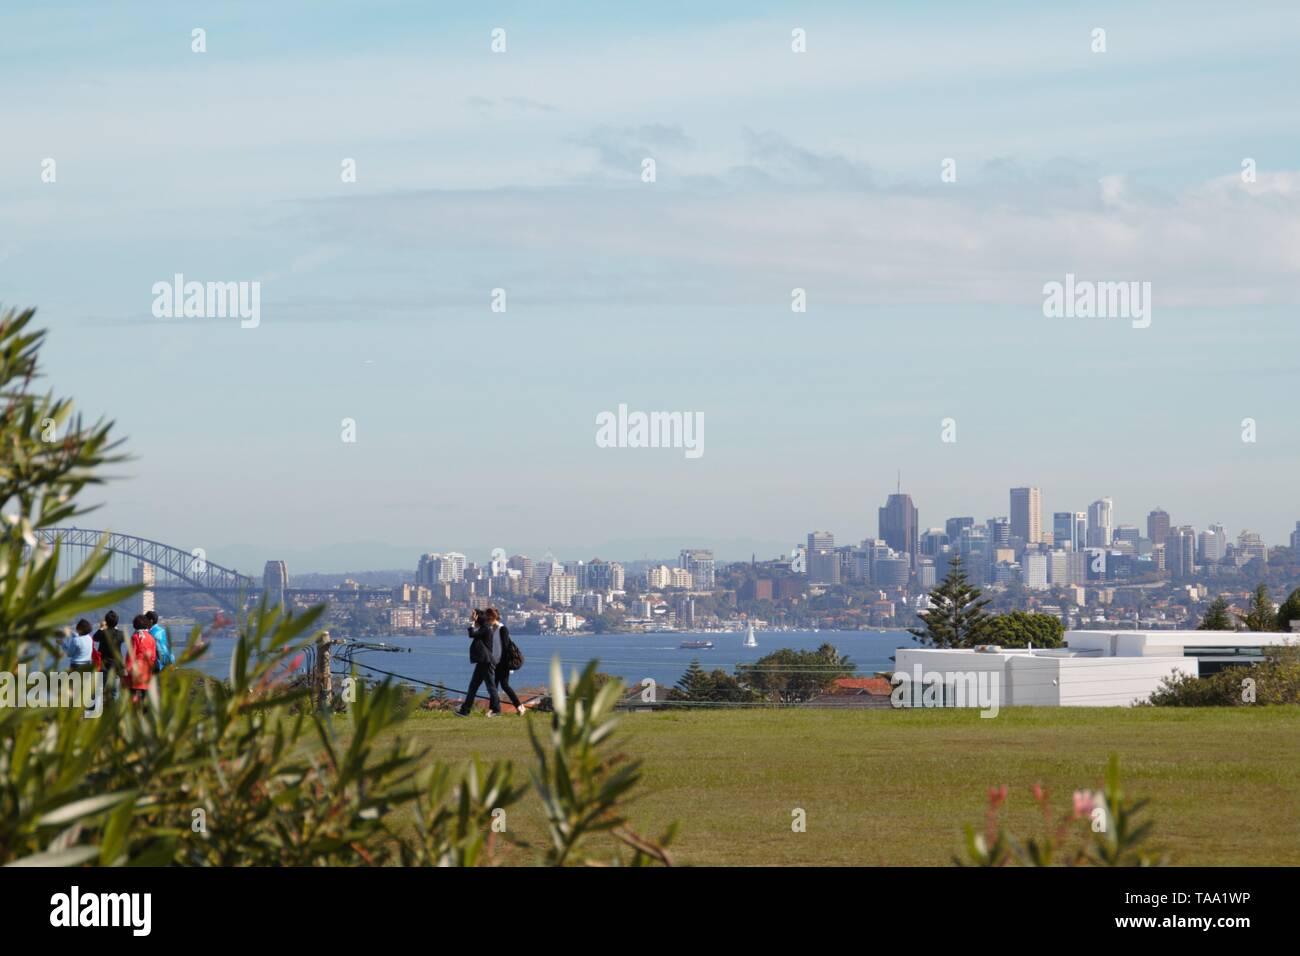 Wonderful skyline of Sydney in Australia from a park a bit far away - Stock Image